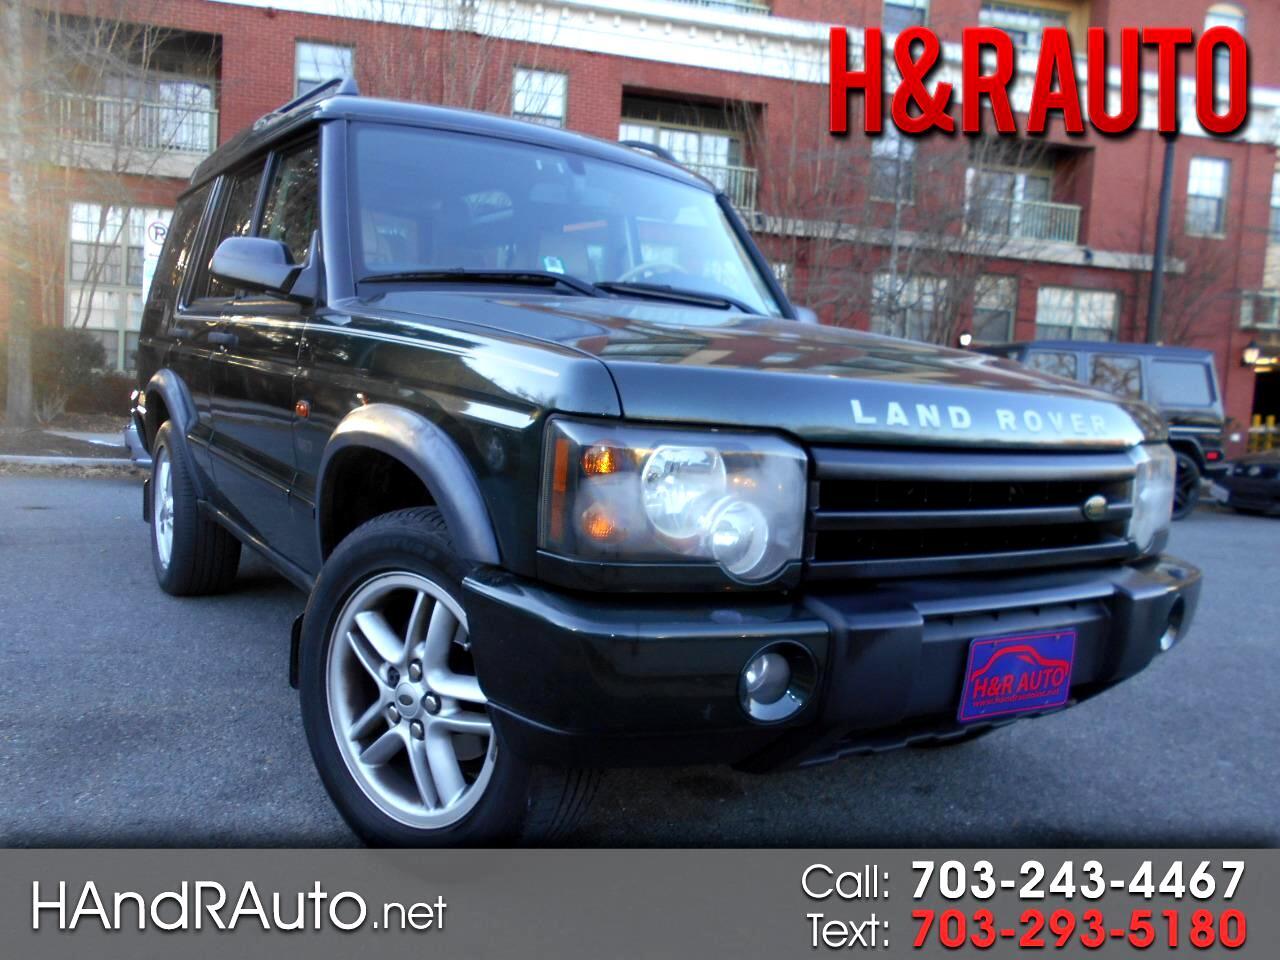 Used 2003 Land Rover Discovery in Arlington, VA | Auto com |  SALTW16463A822174